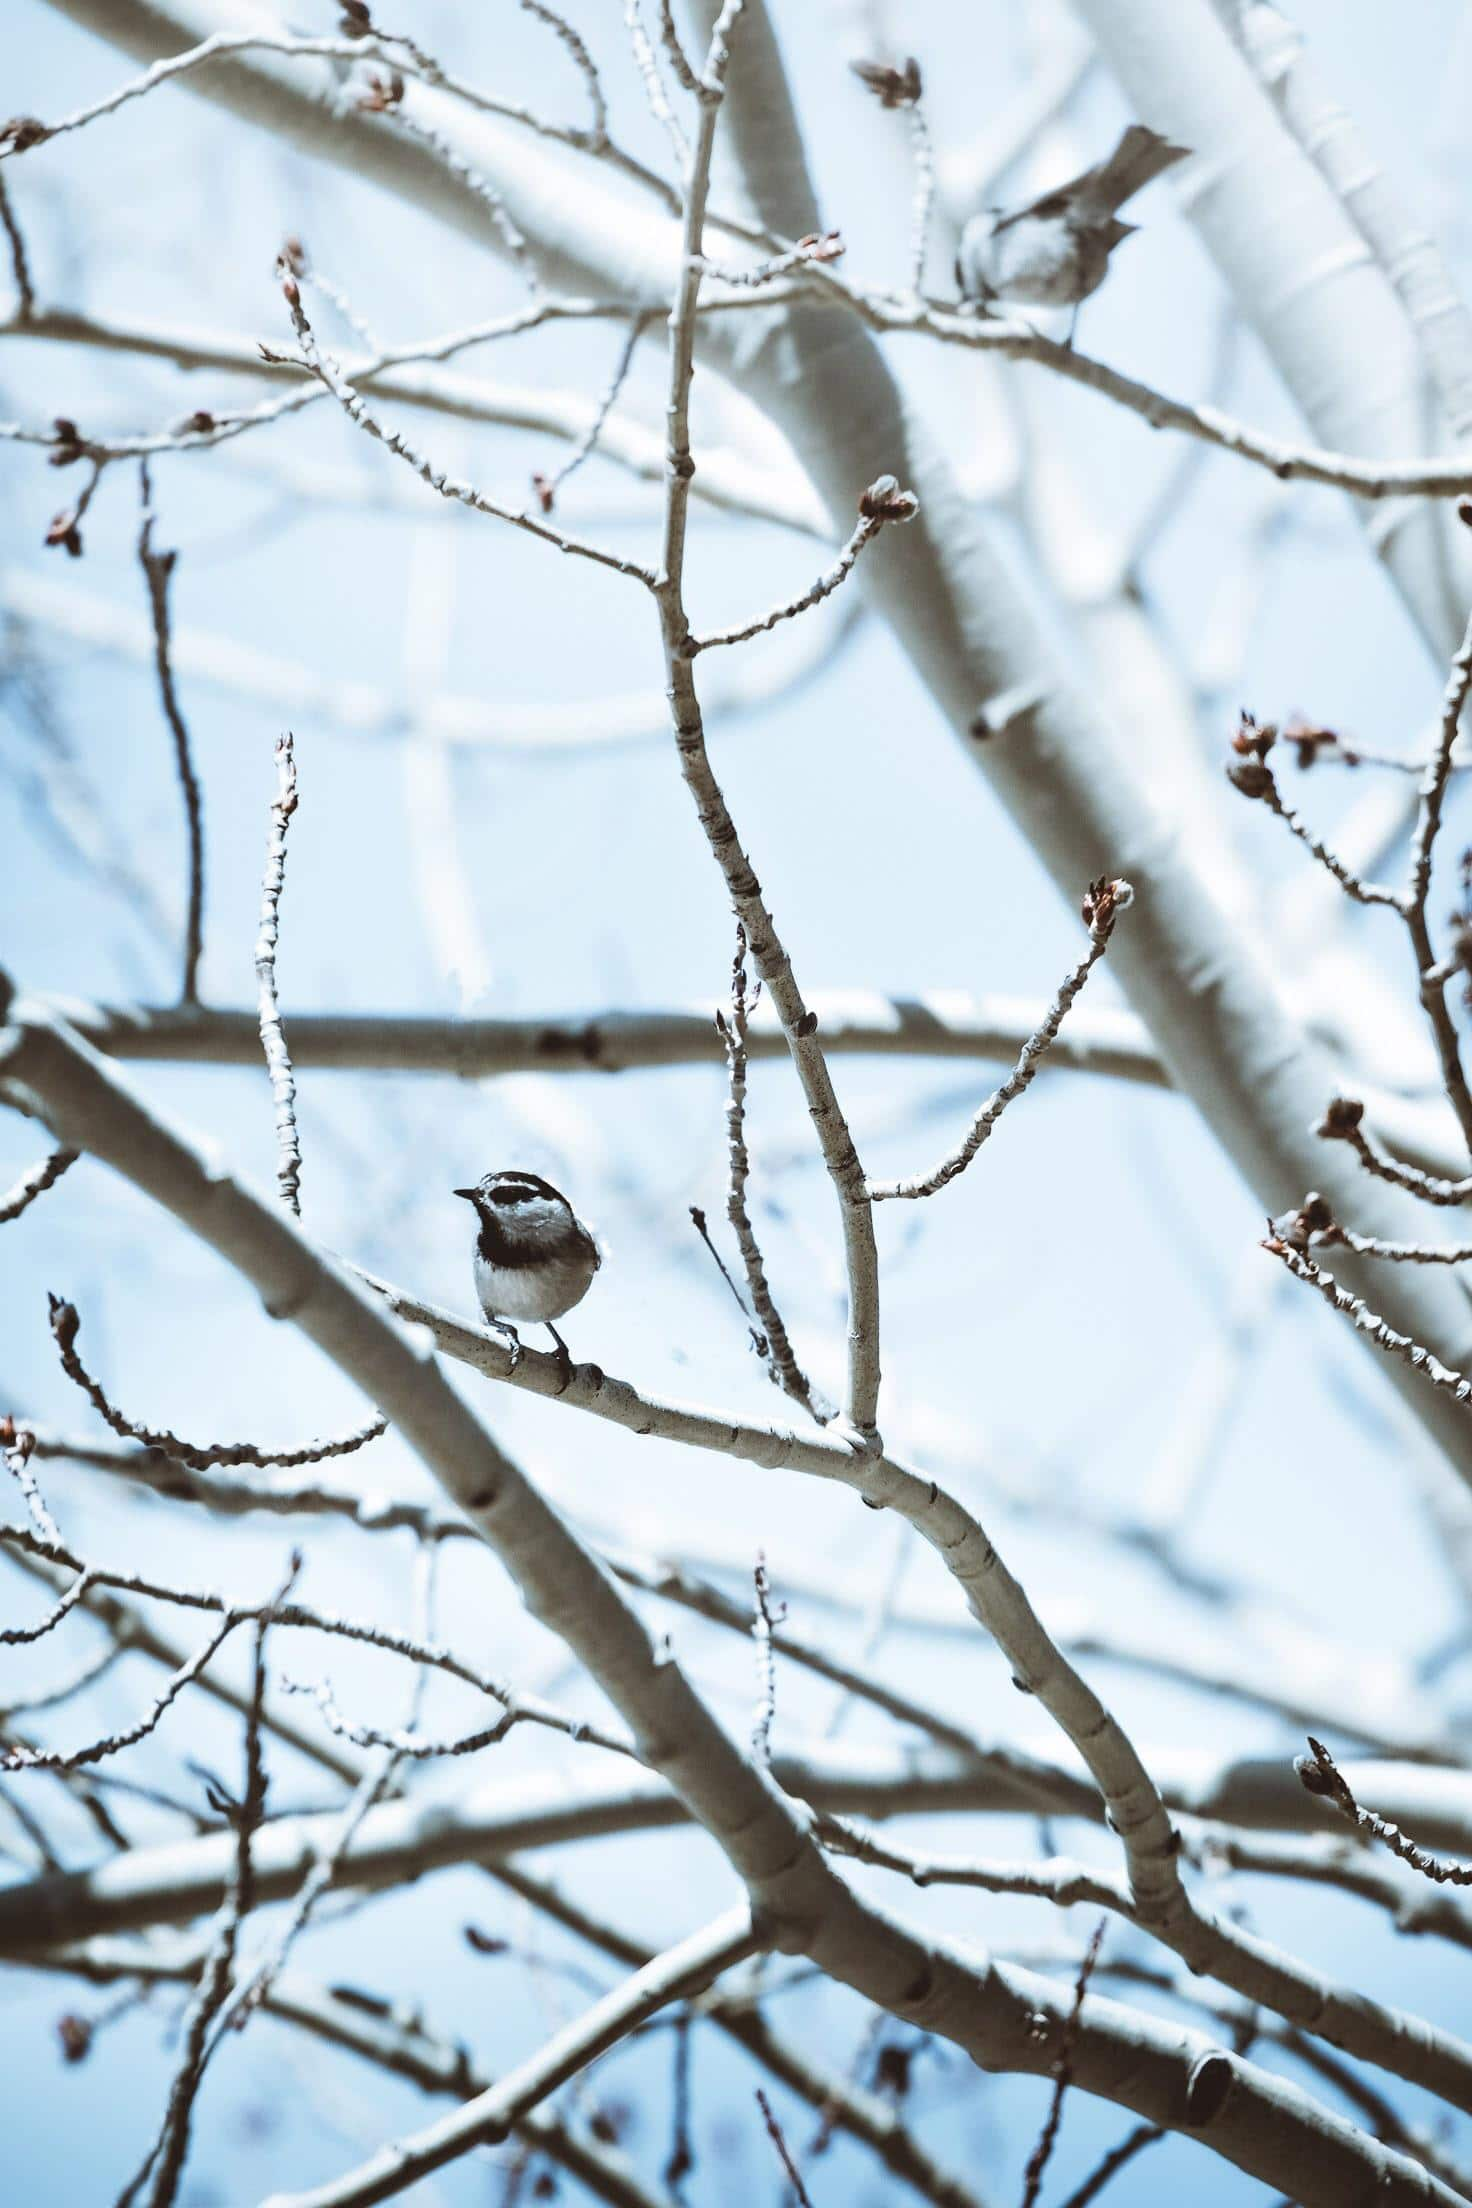 pájaro en ramas de árbol nevado